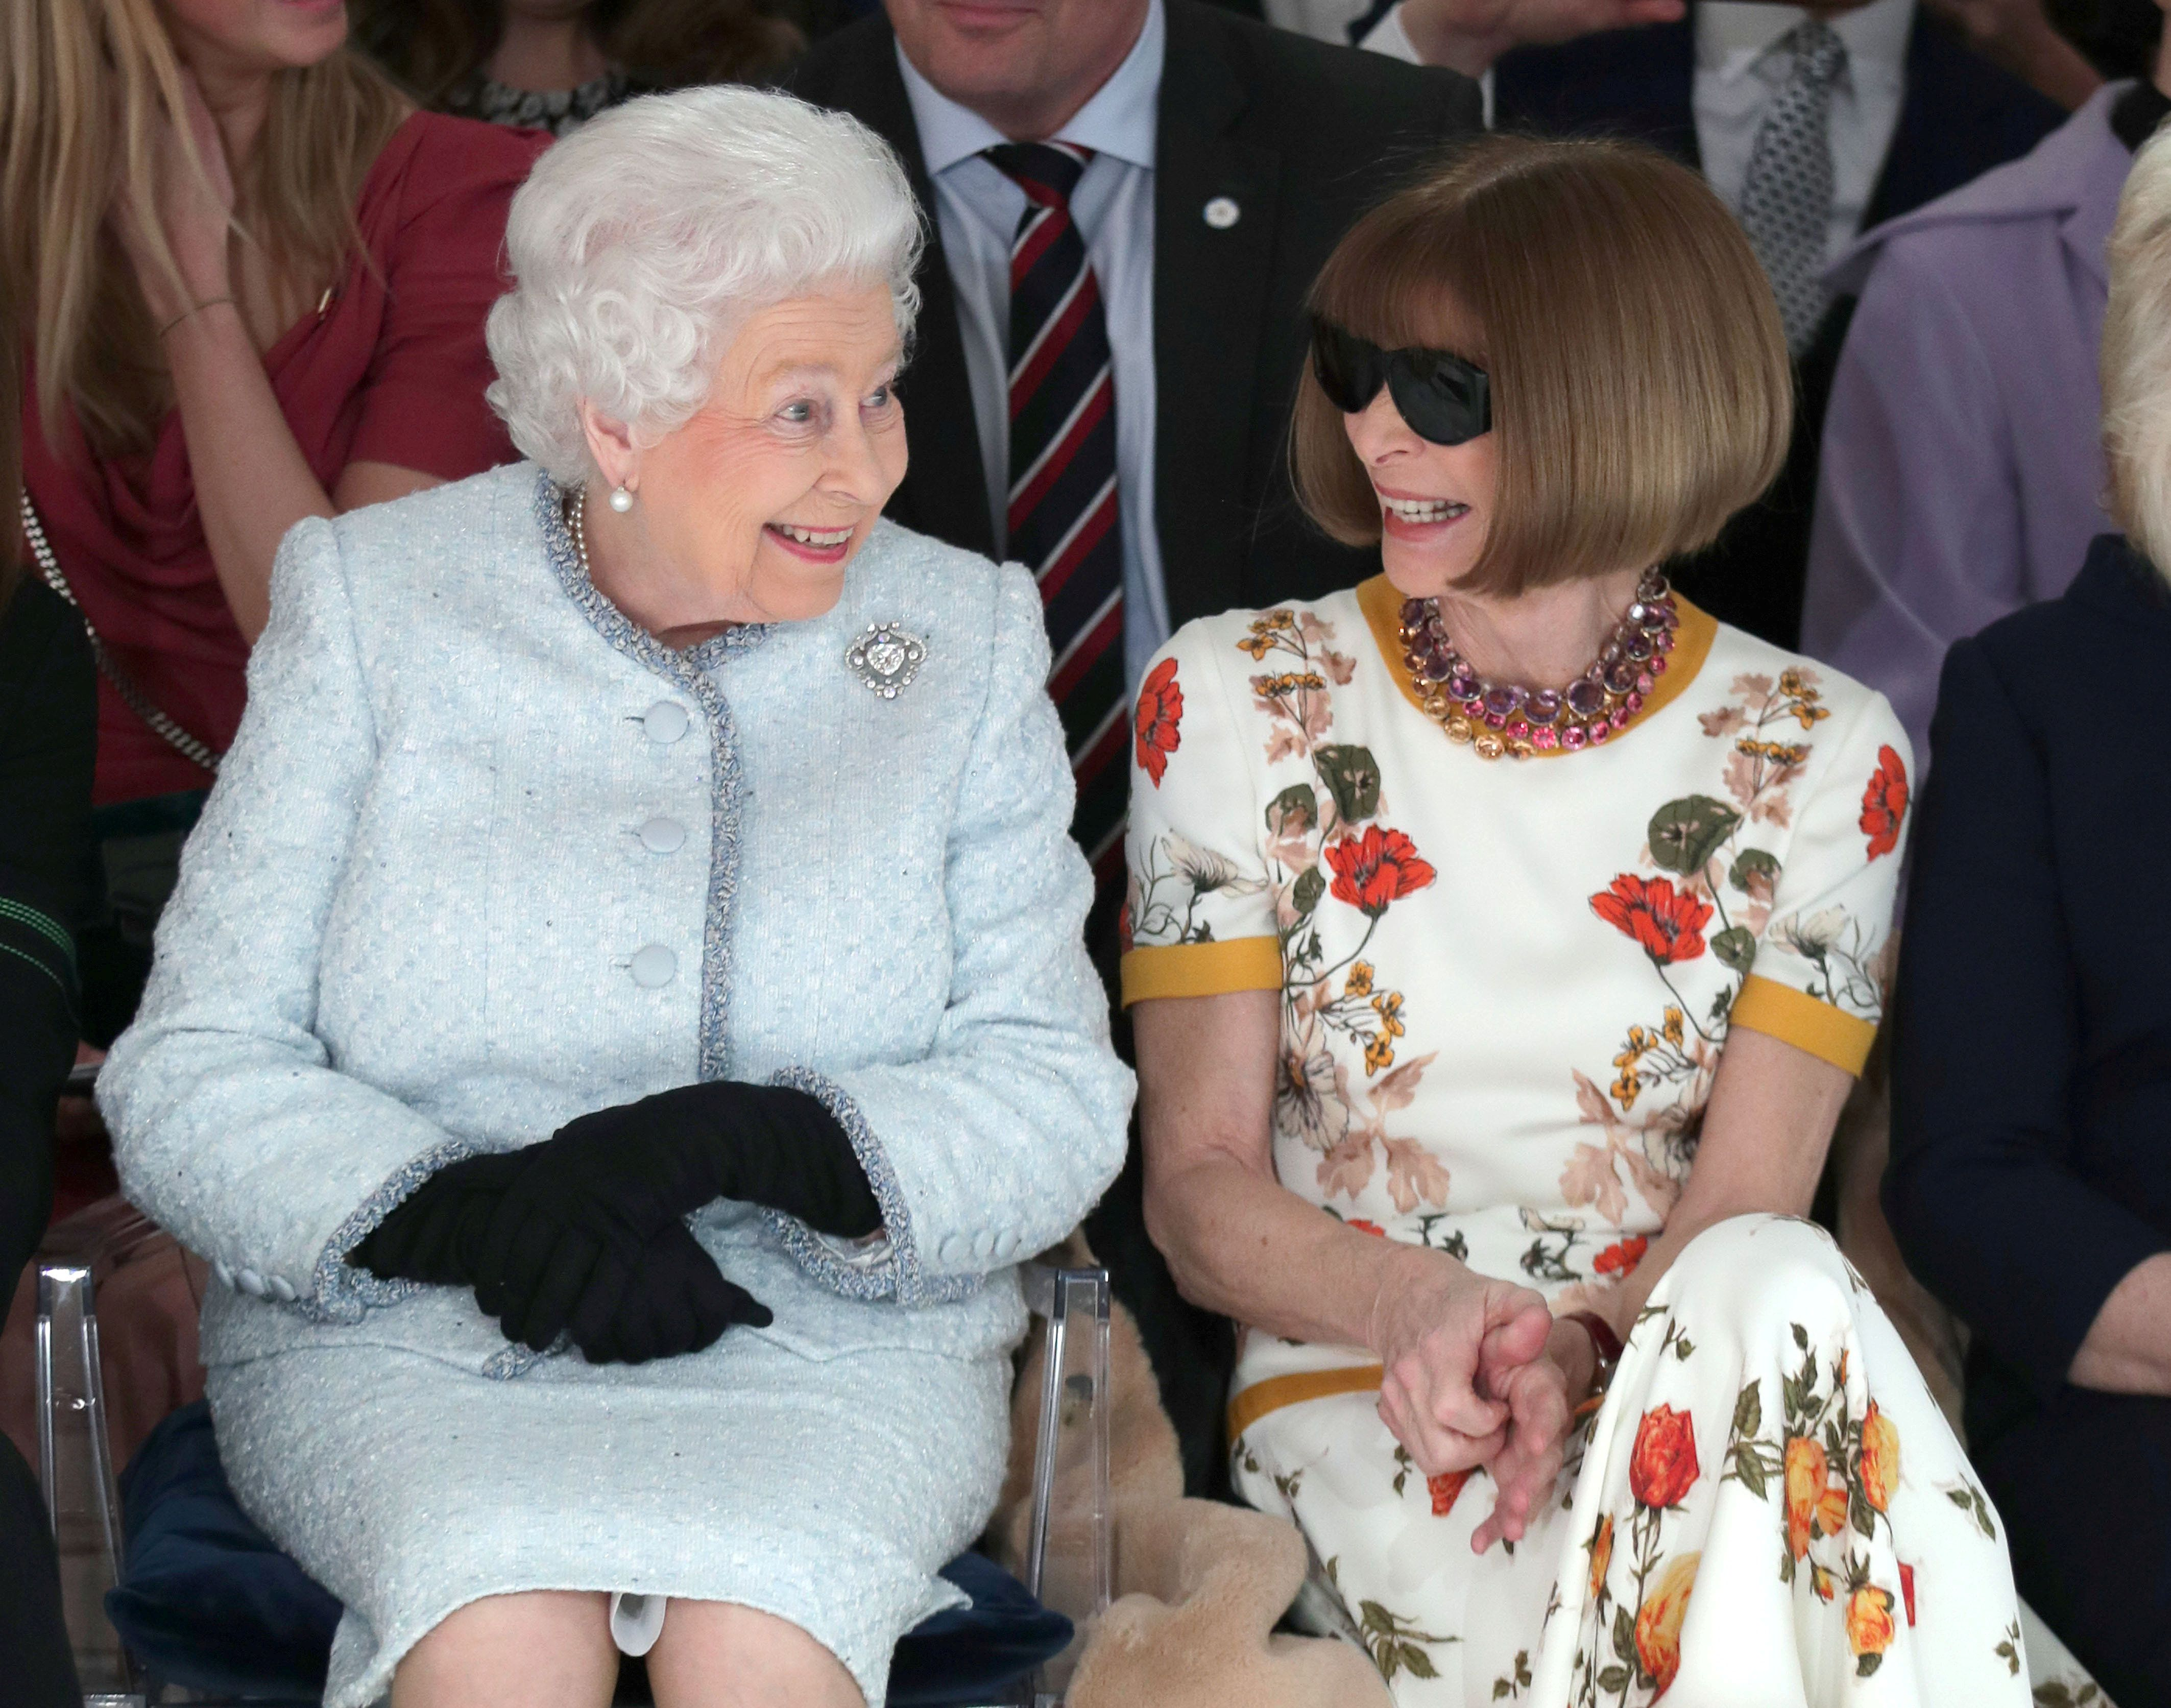 H εμφάνιση-έκπληξη από τη Βασίλισσα Ελισάβετ στην Εβδομάδα Μόδας του Λονδίνου που ξετρέλανε το διαδίκτυο